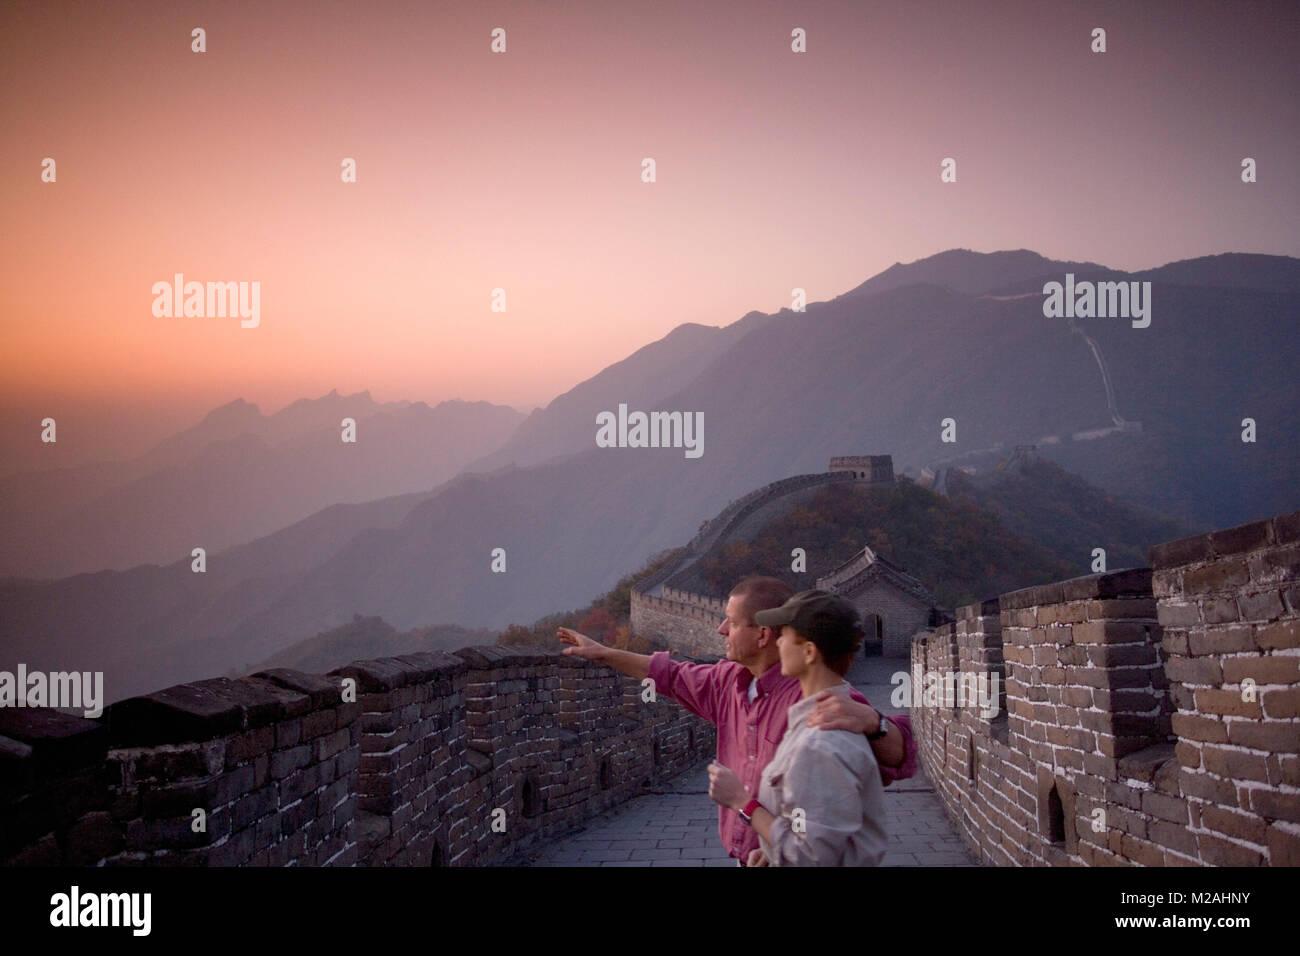 China. Mutianyu, near Beijing. The Great Wall. UNESCO World Heritage site. Tourists. - Stock Image